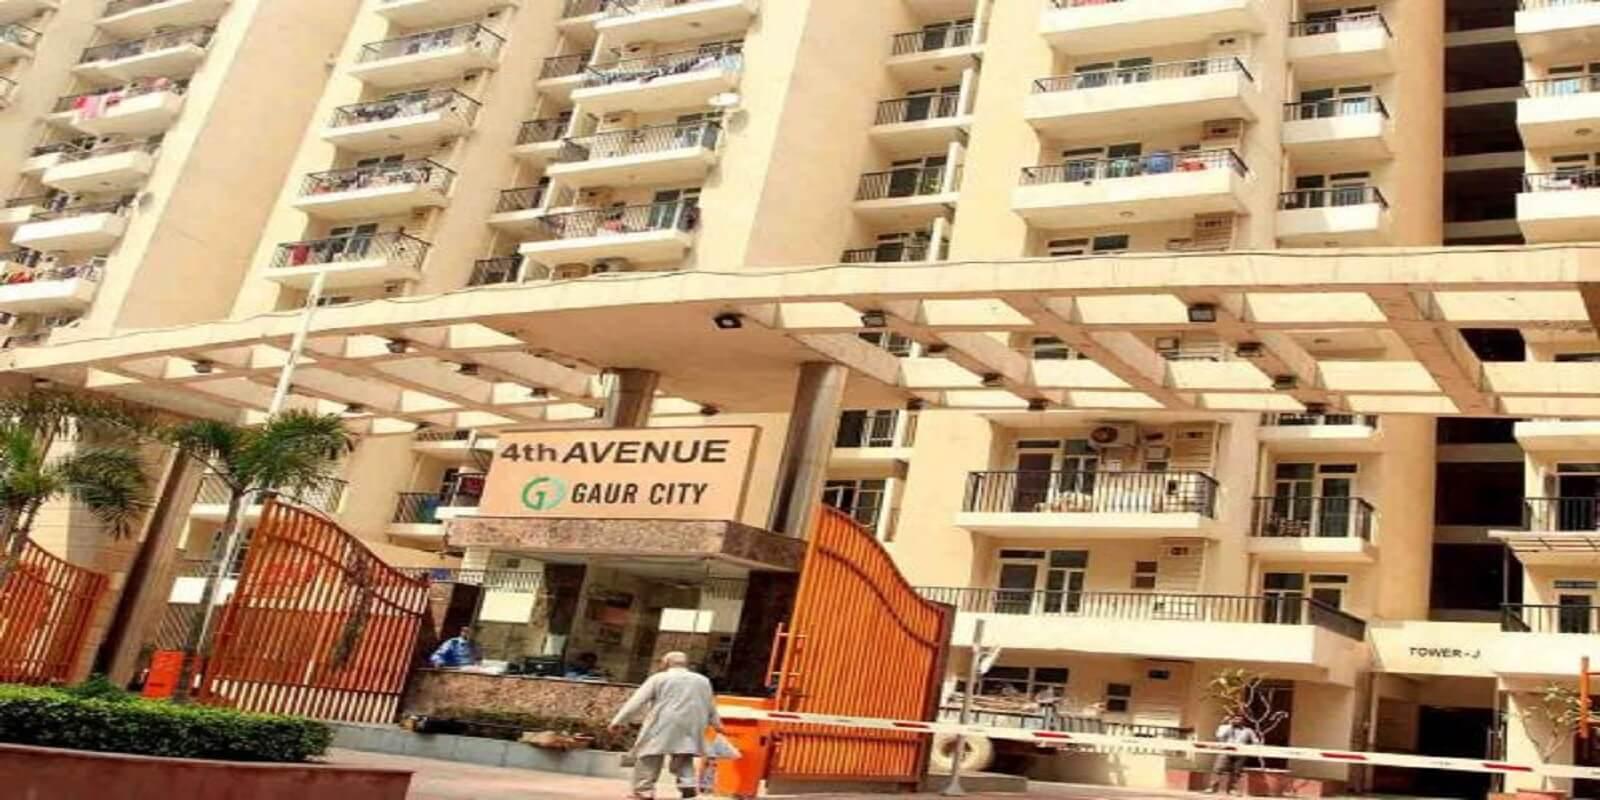 gaur city 4th avenue project large image1